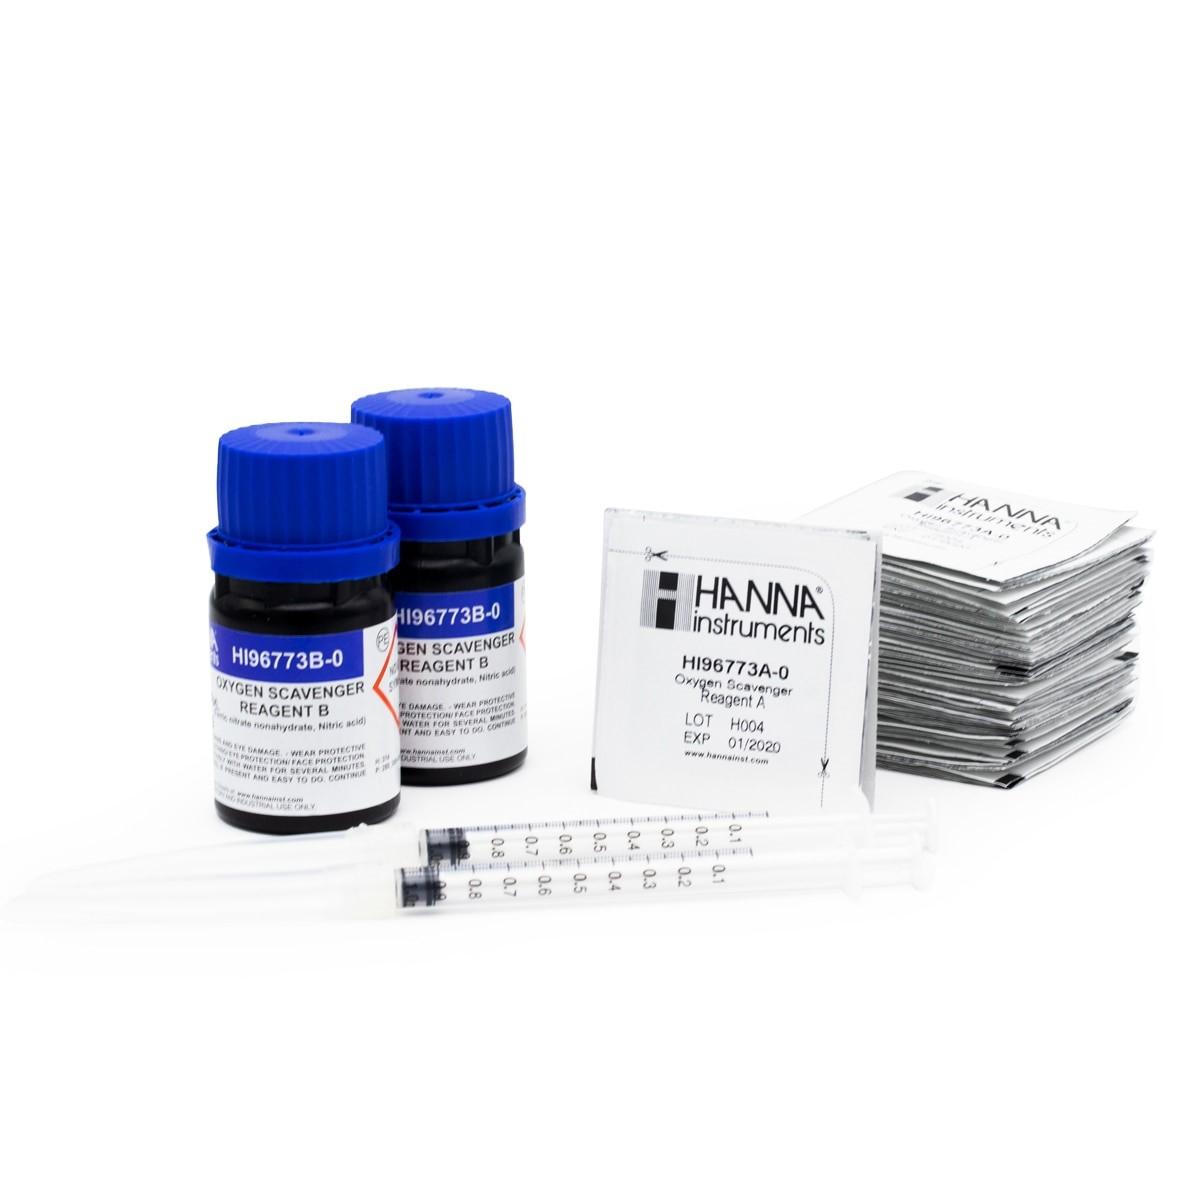 Oxygen Scavengers Reagents (150 tests) – HI96773-03